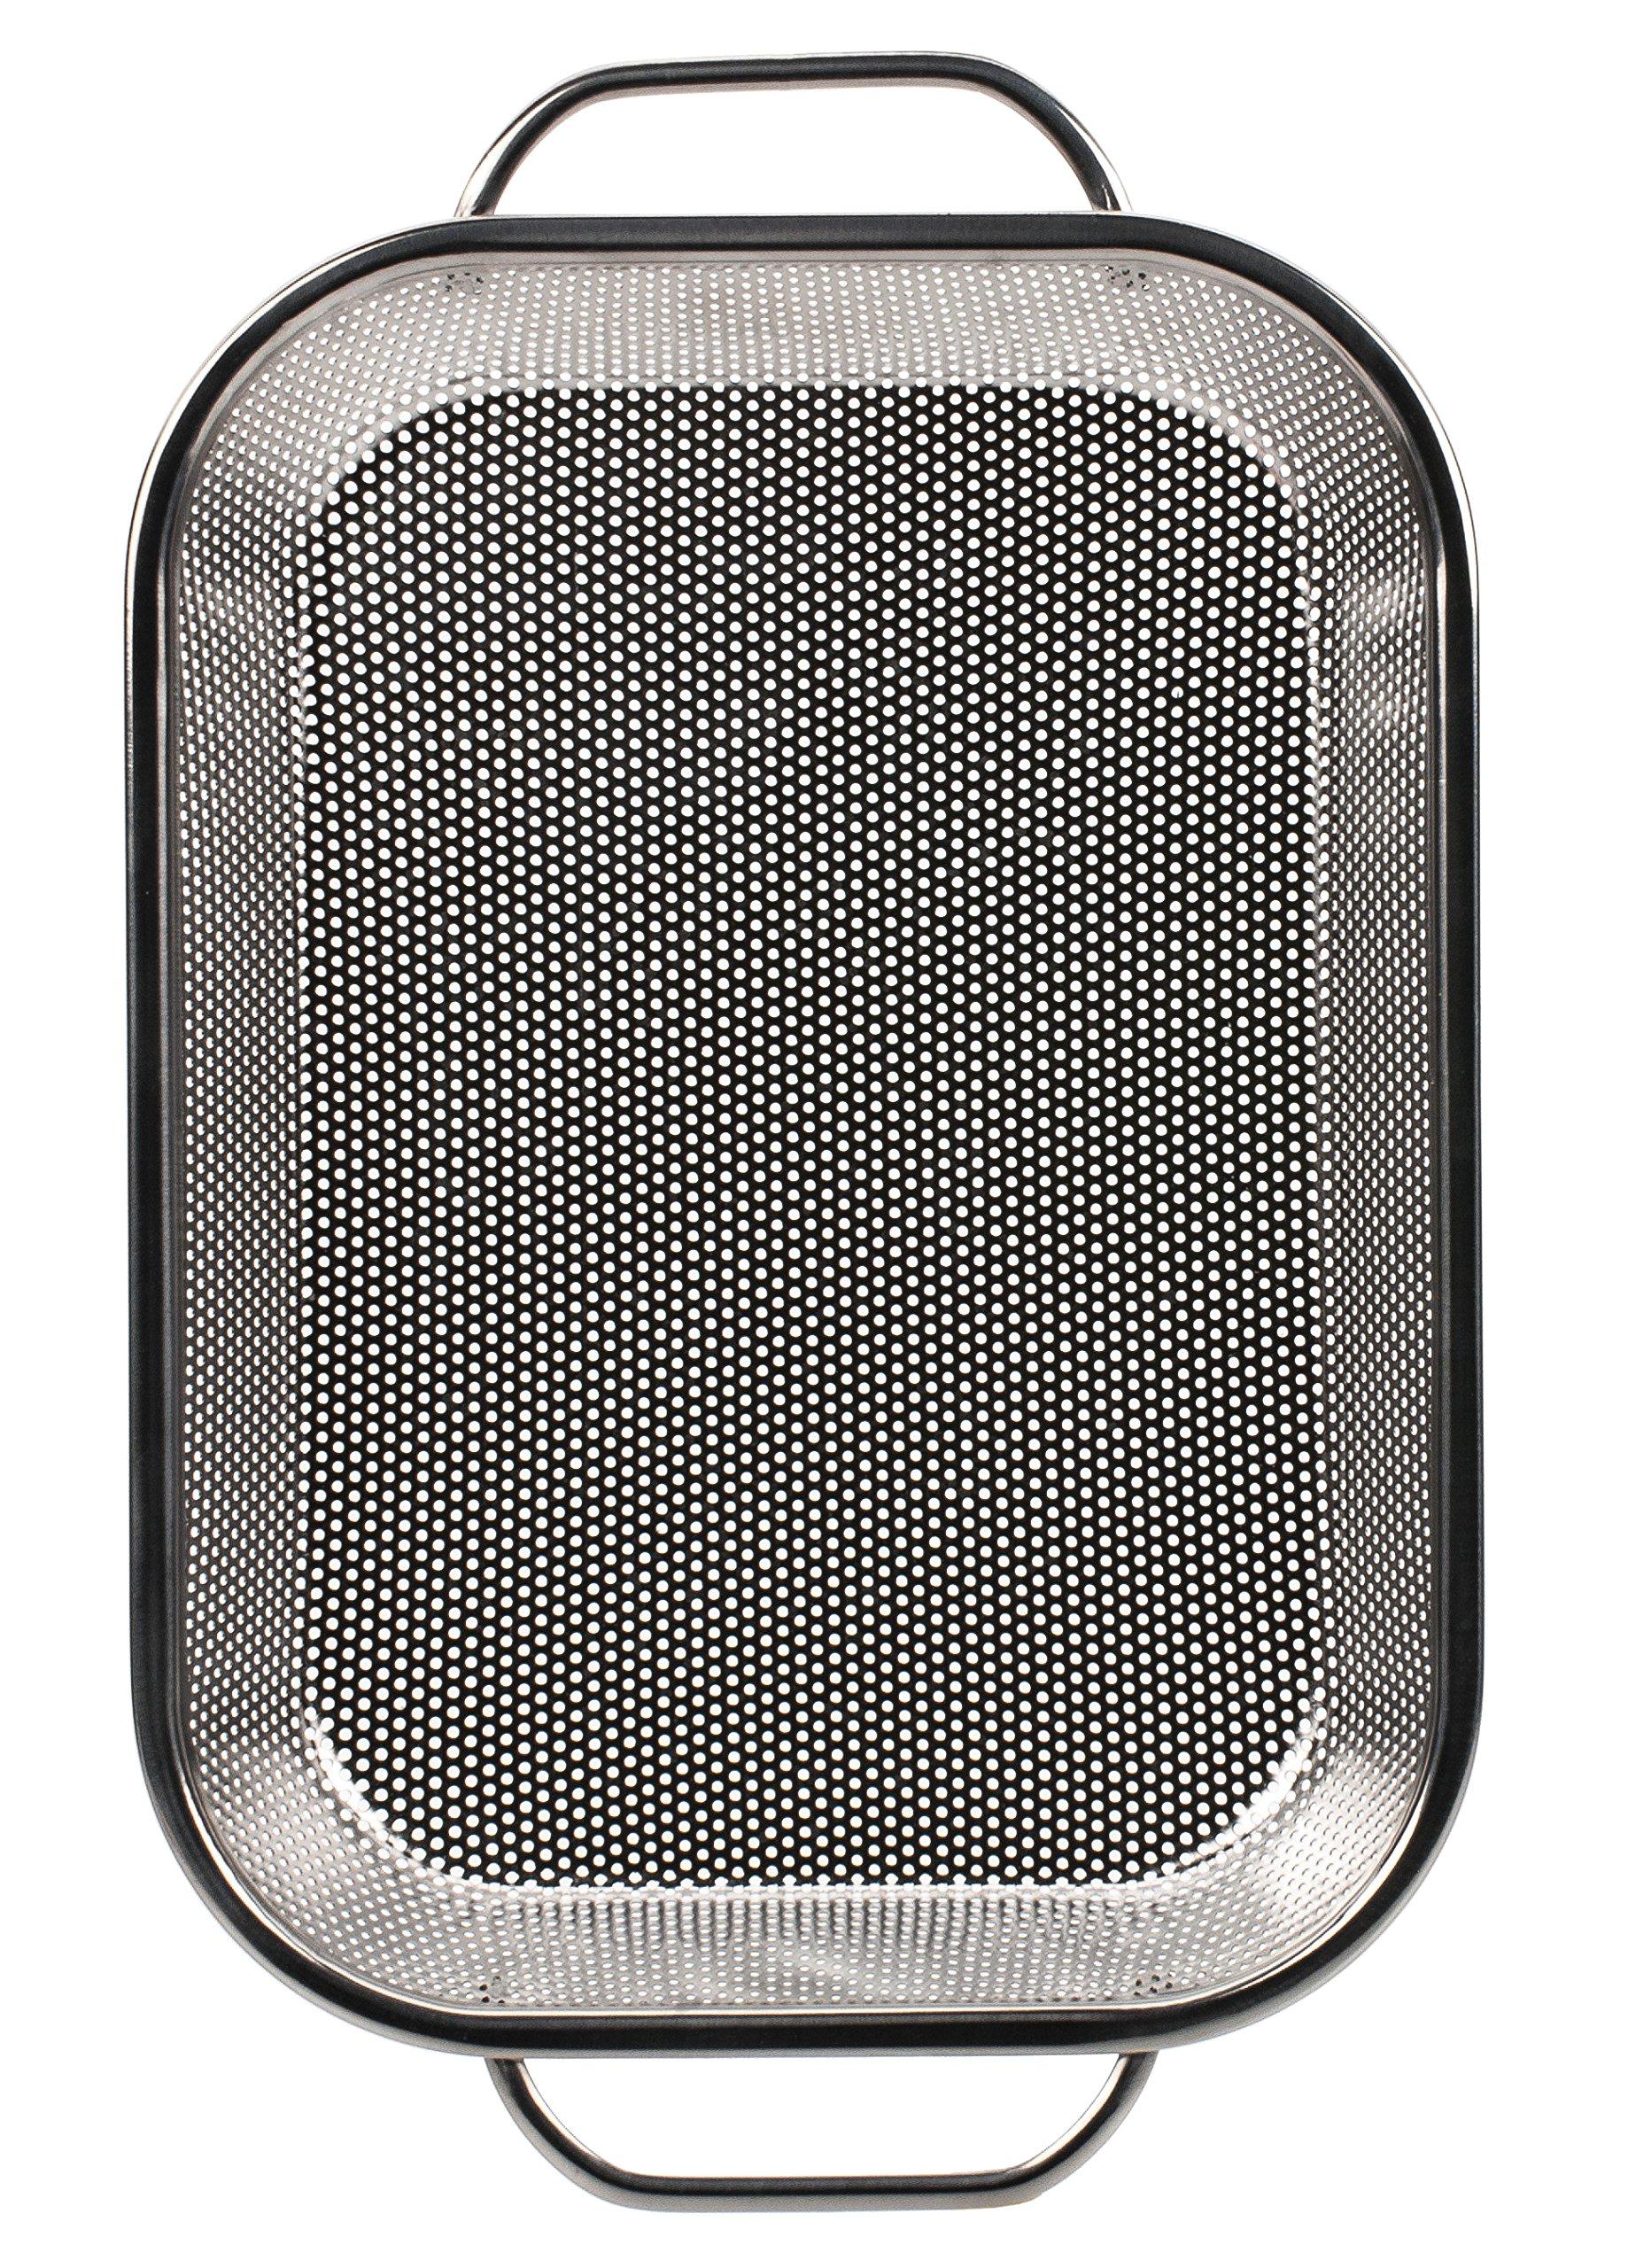 RSVP BBQ Precision Pierced Stainless Steel Roasting Pan (BQ-RP)